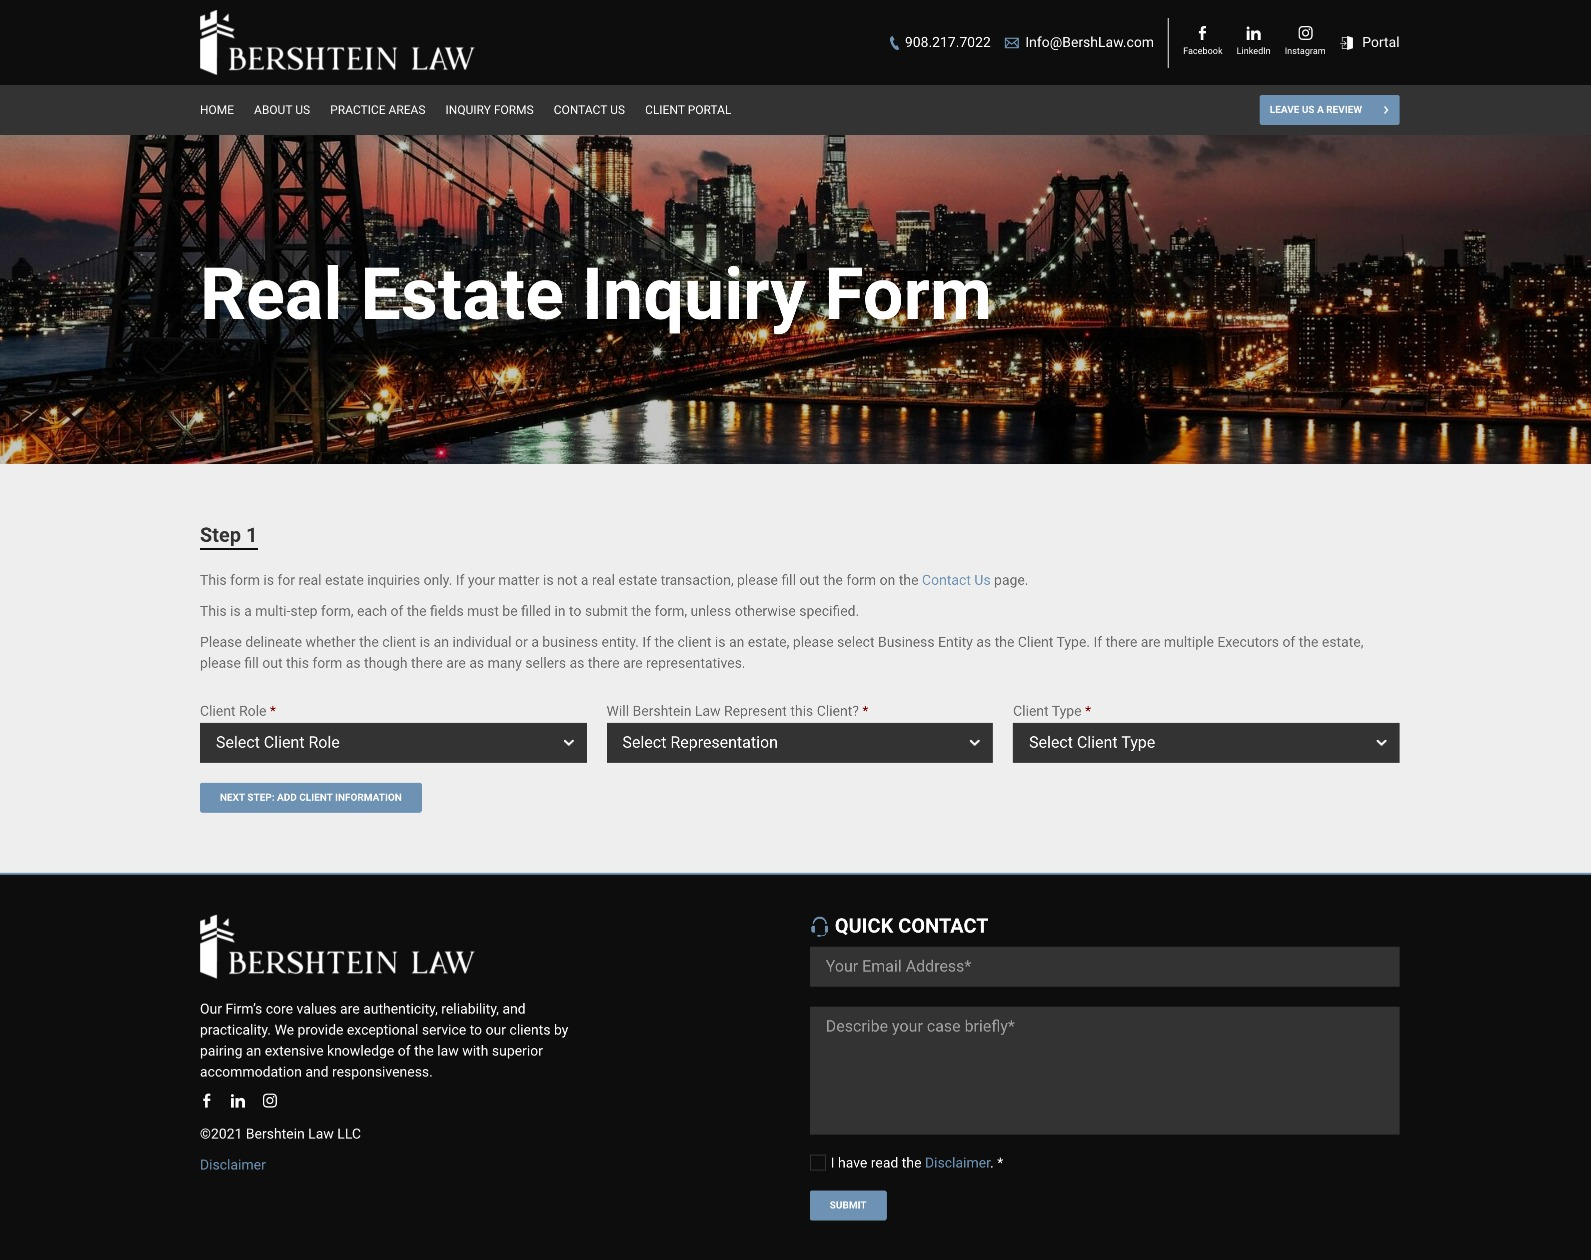 bershlaw-inquiry-form (1) (1)